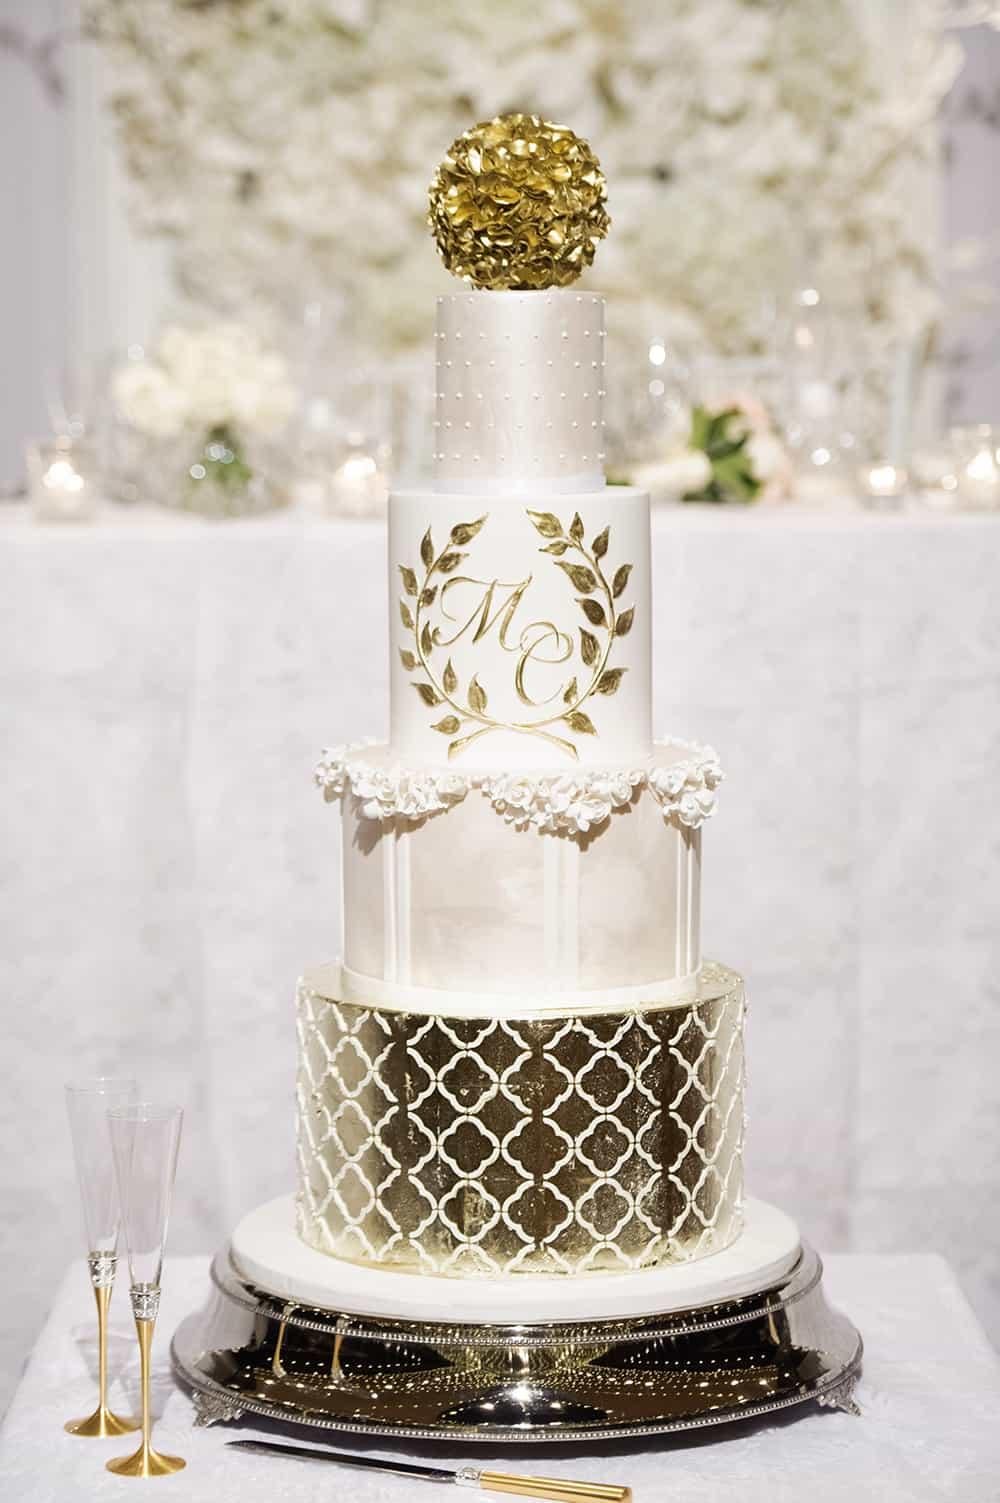 Real wedding couple Catherine and Michael's wedding cake.